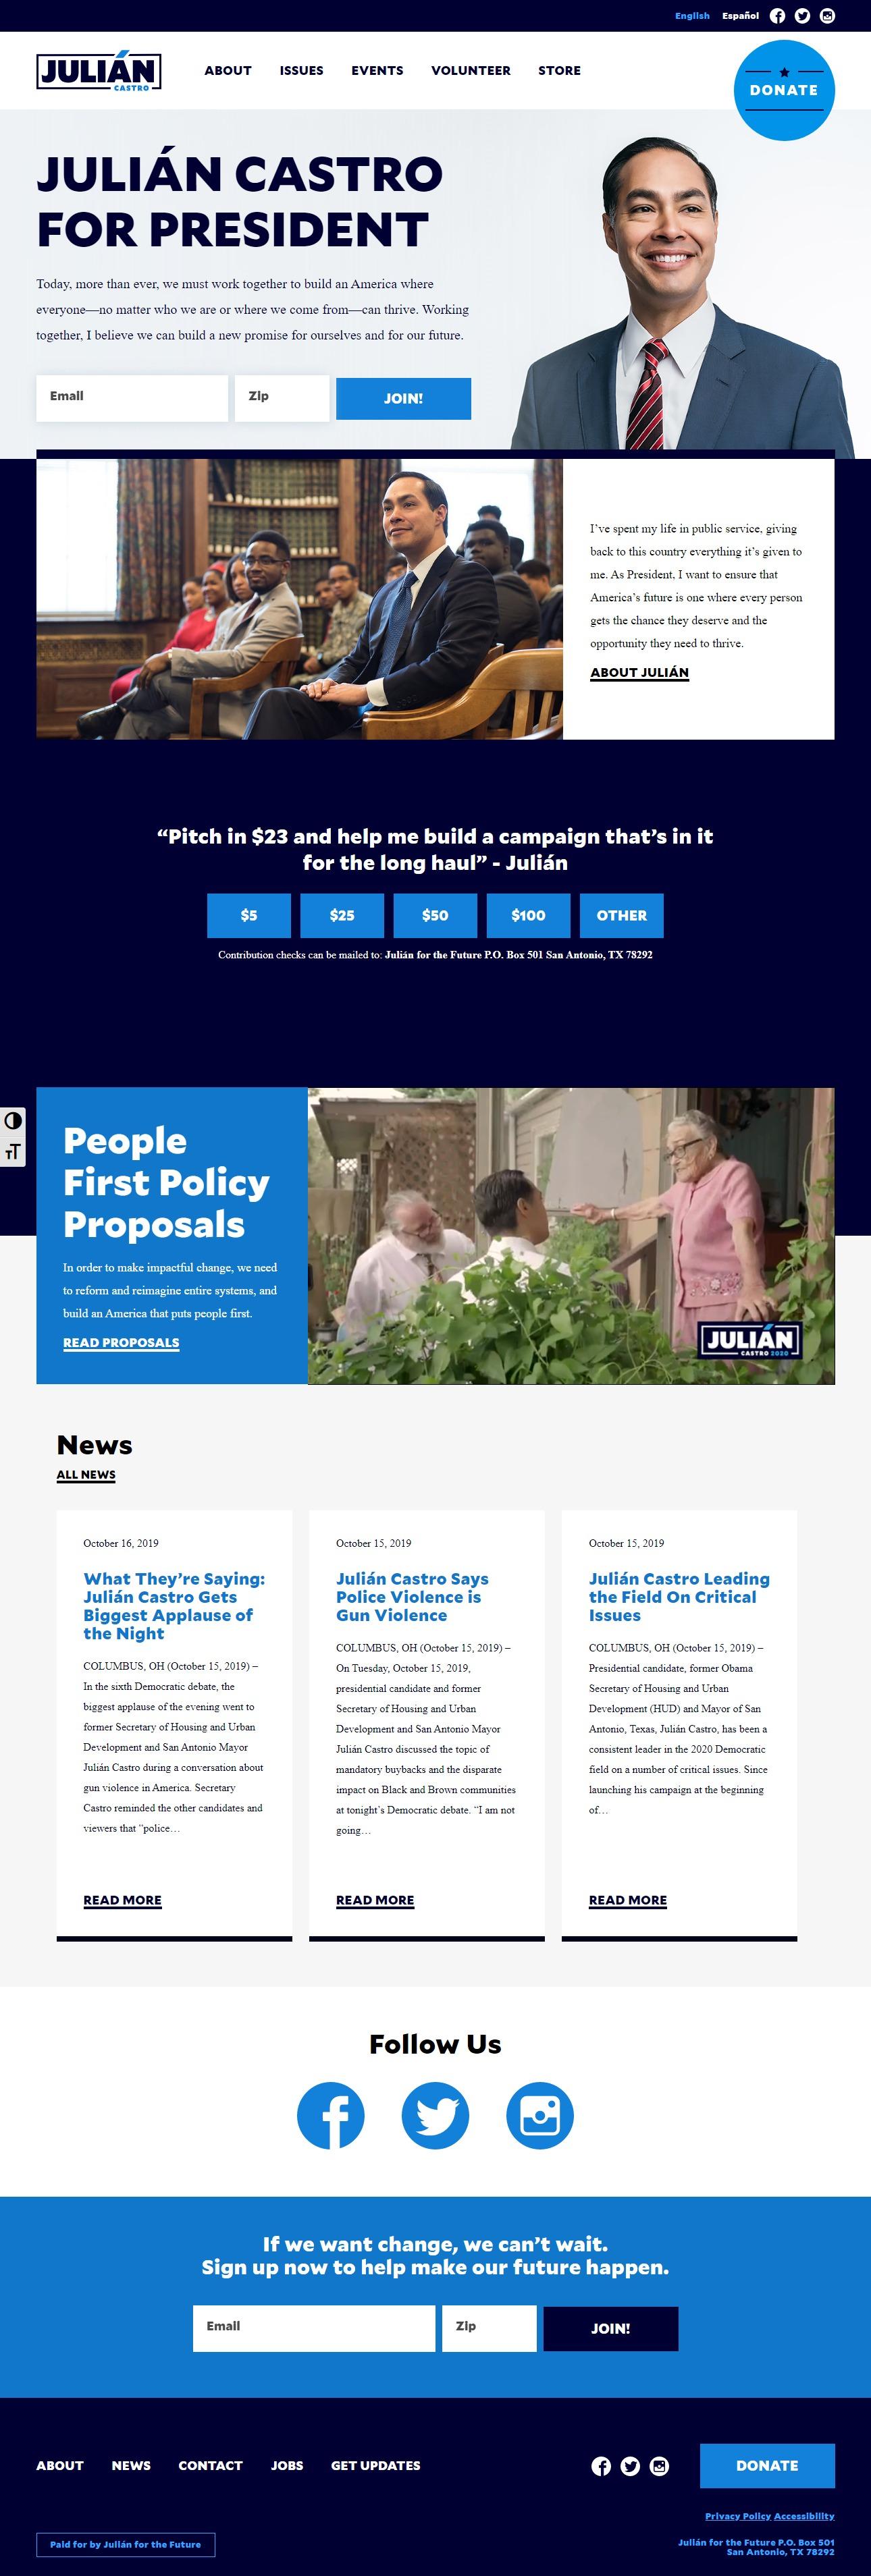 Homepage Snapshot for November 1, 2019: Former Mayor Julián Castro